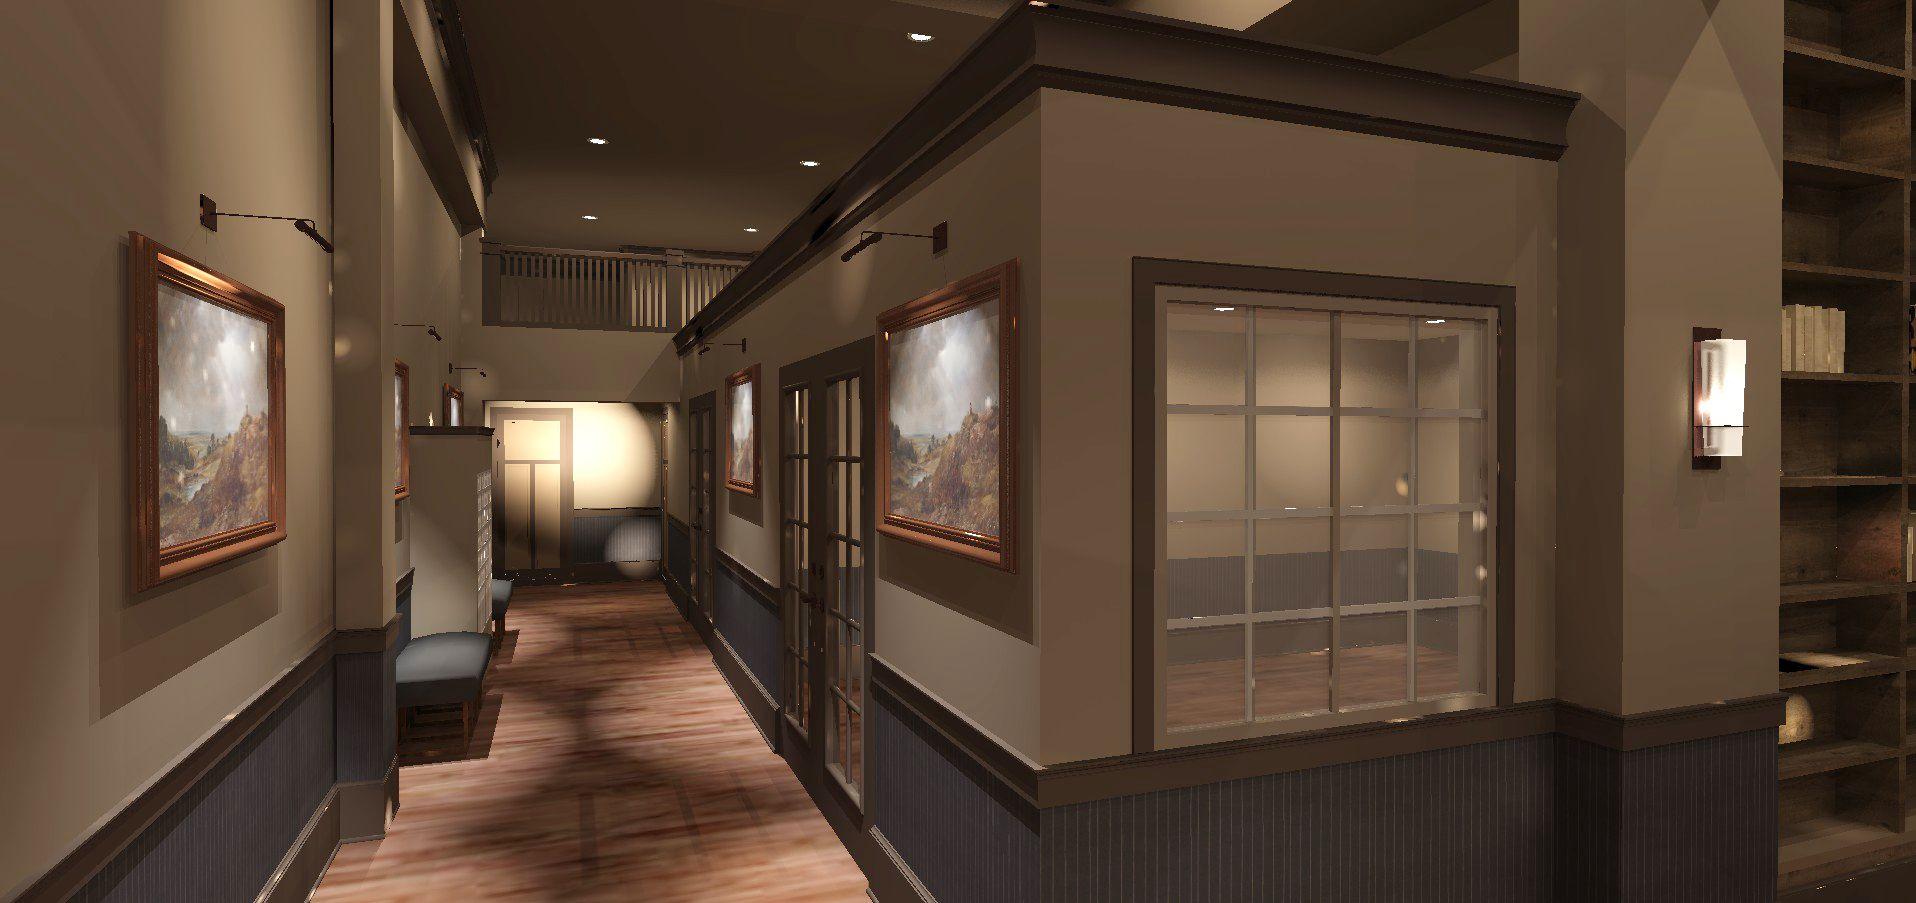 Belvue-lobby-image-3